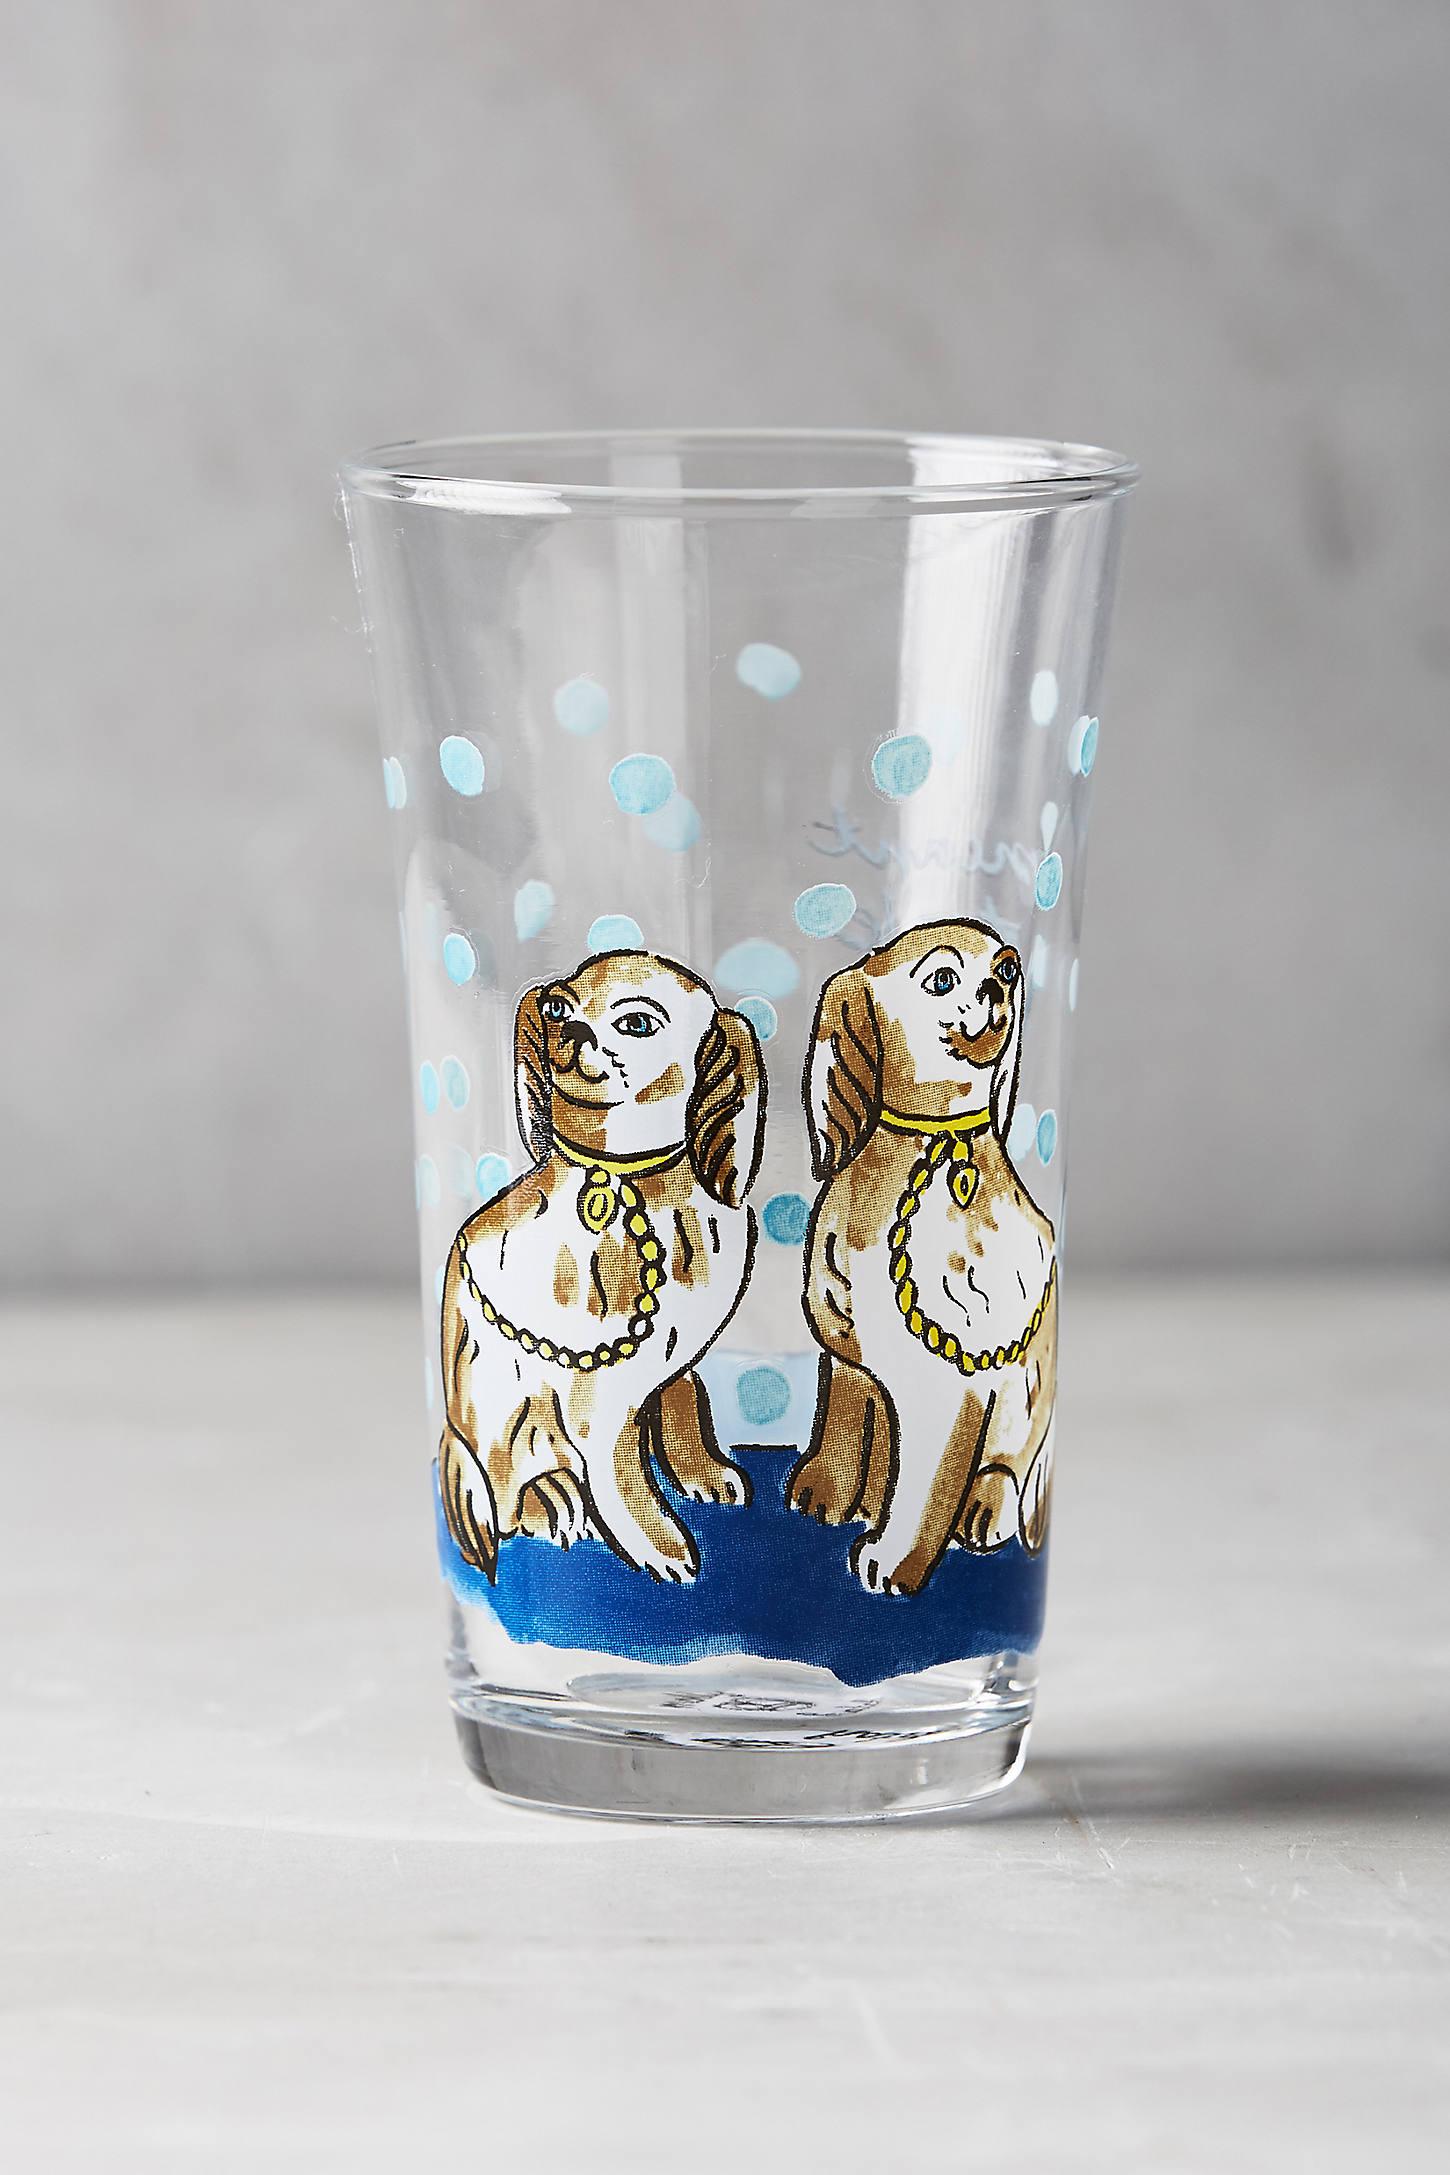 Menagerie Juice Glass